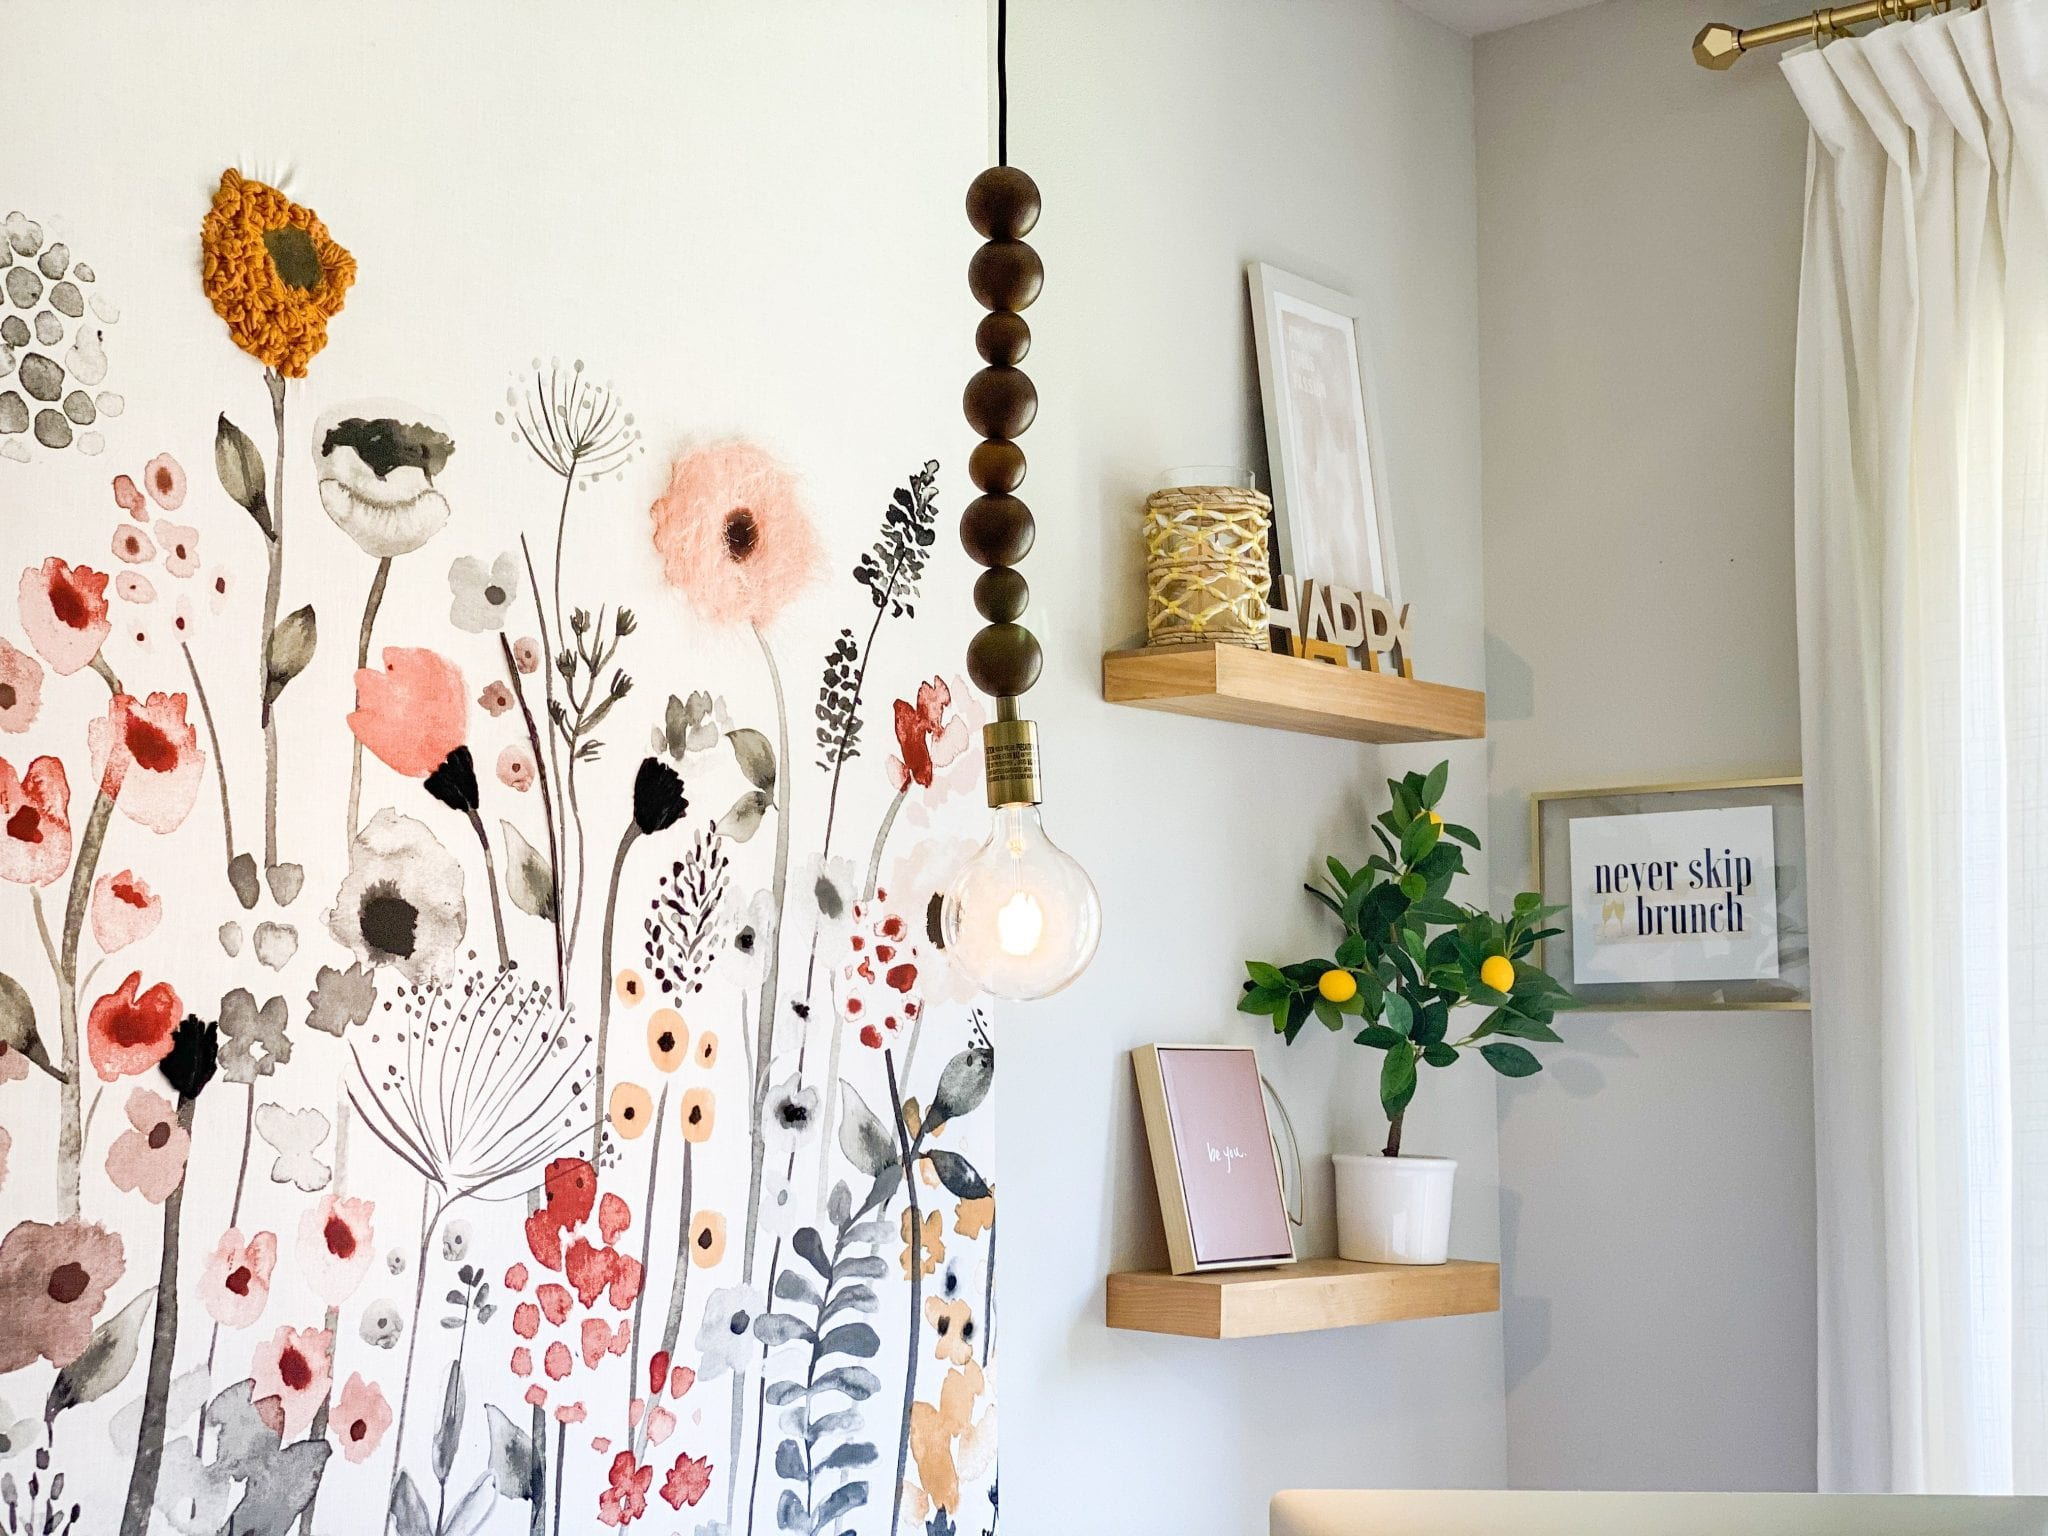 DIY Tray | Tile DIY Ideas | DIY Home Decor | home decor ideas | Diy projects | Never Skip Brunch by Cara Newhart | #home #diy #decor #neverskipbrunch